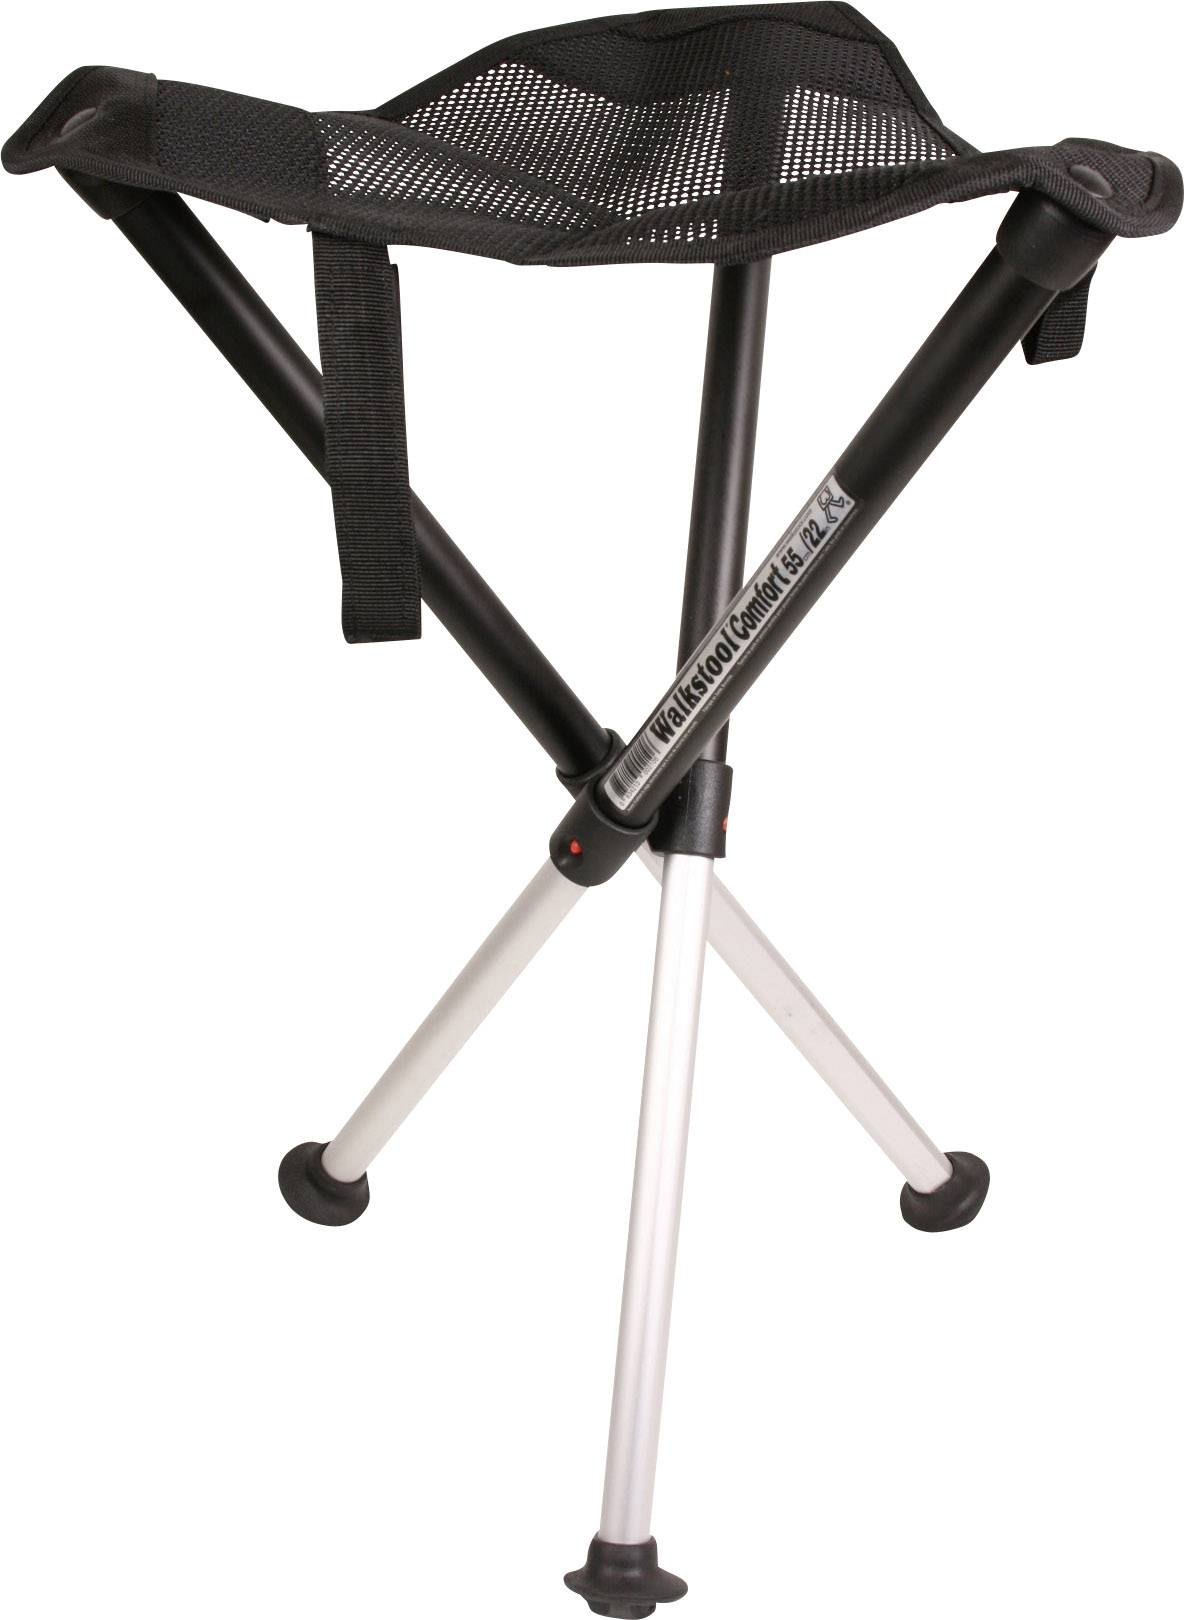 Kempingová židle Walkstool Comfort XL černá/stříbrná 63547